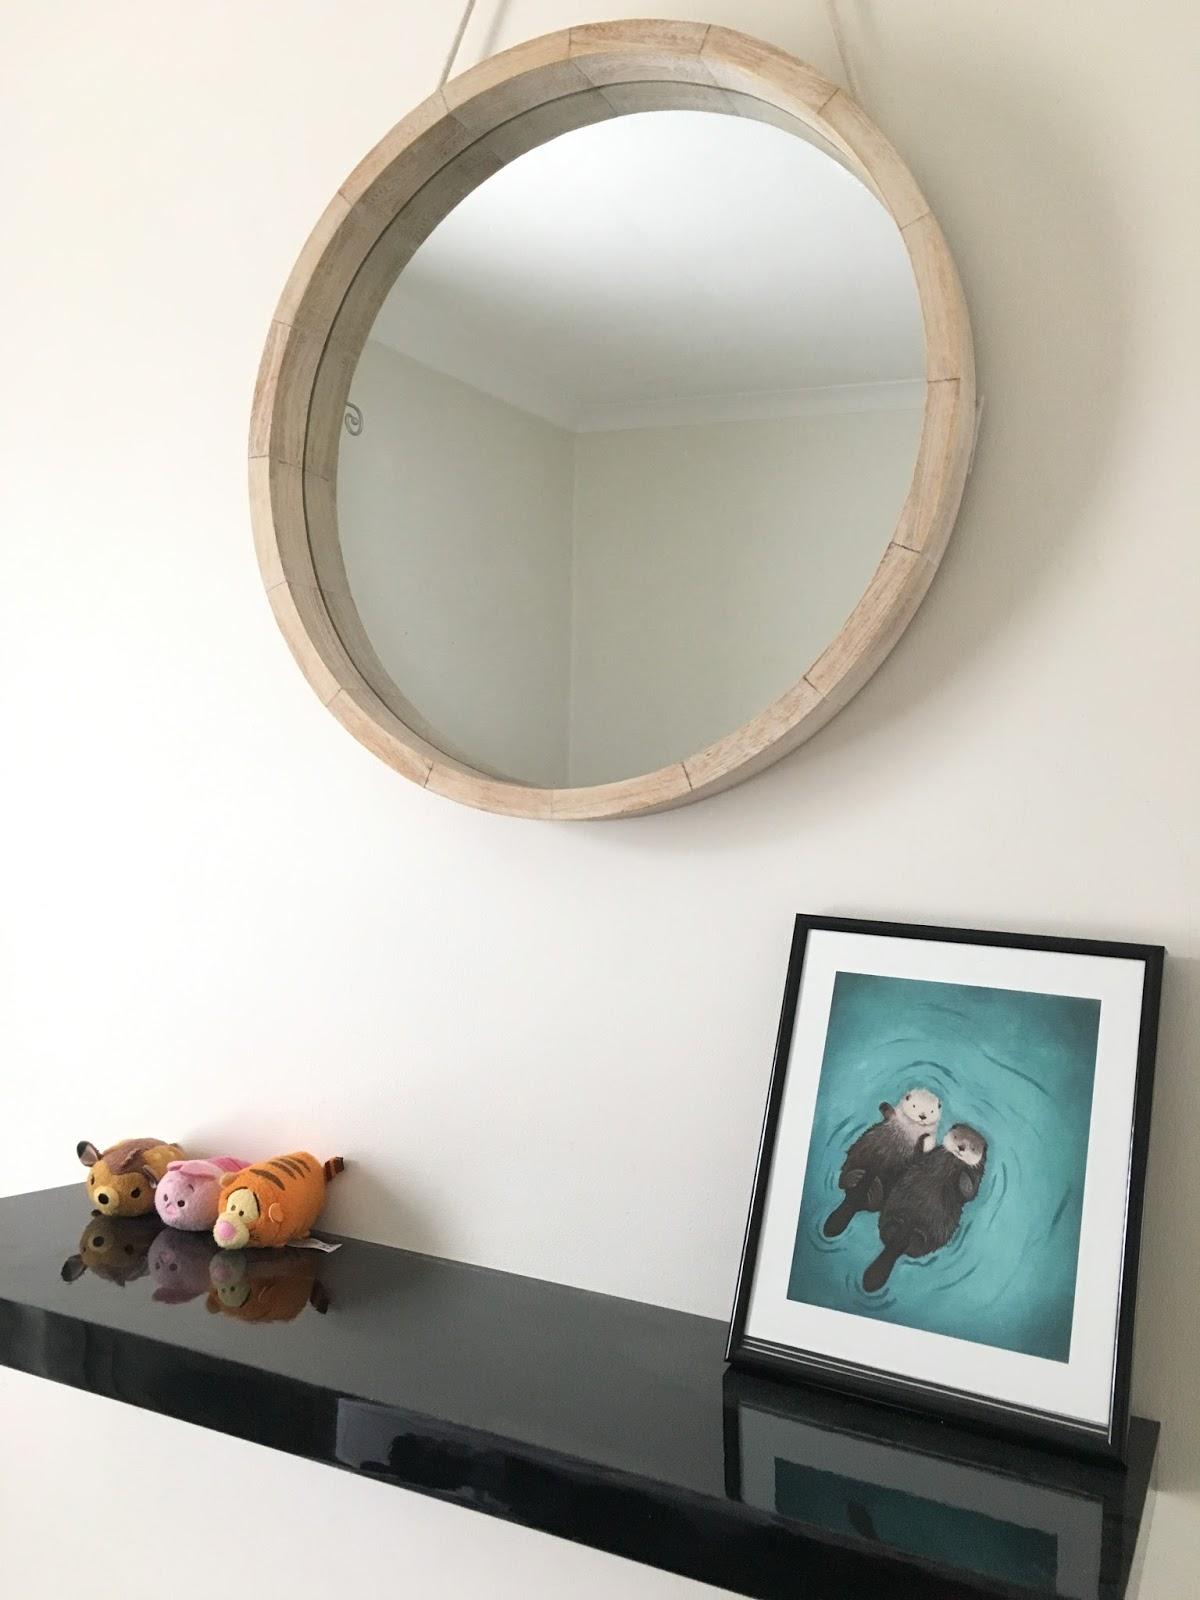 Sweet allure my bedroom makeover wishlist 2016 interiors Scandinavian design mirror tsum tsum otters print frame